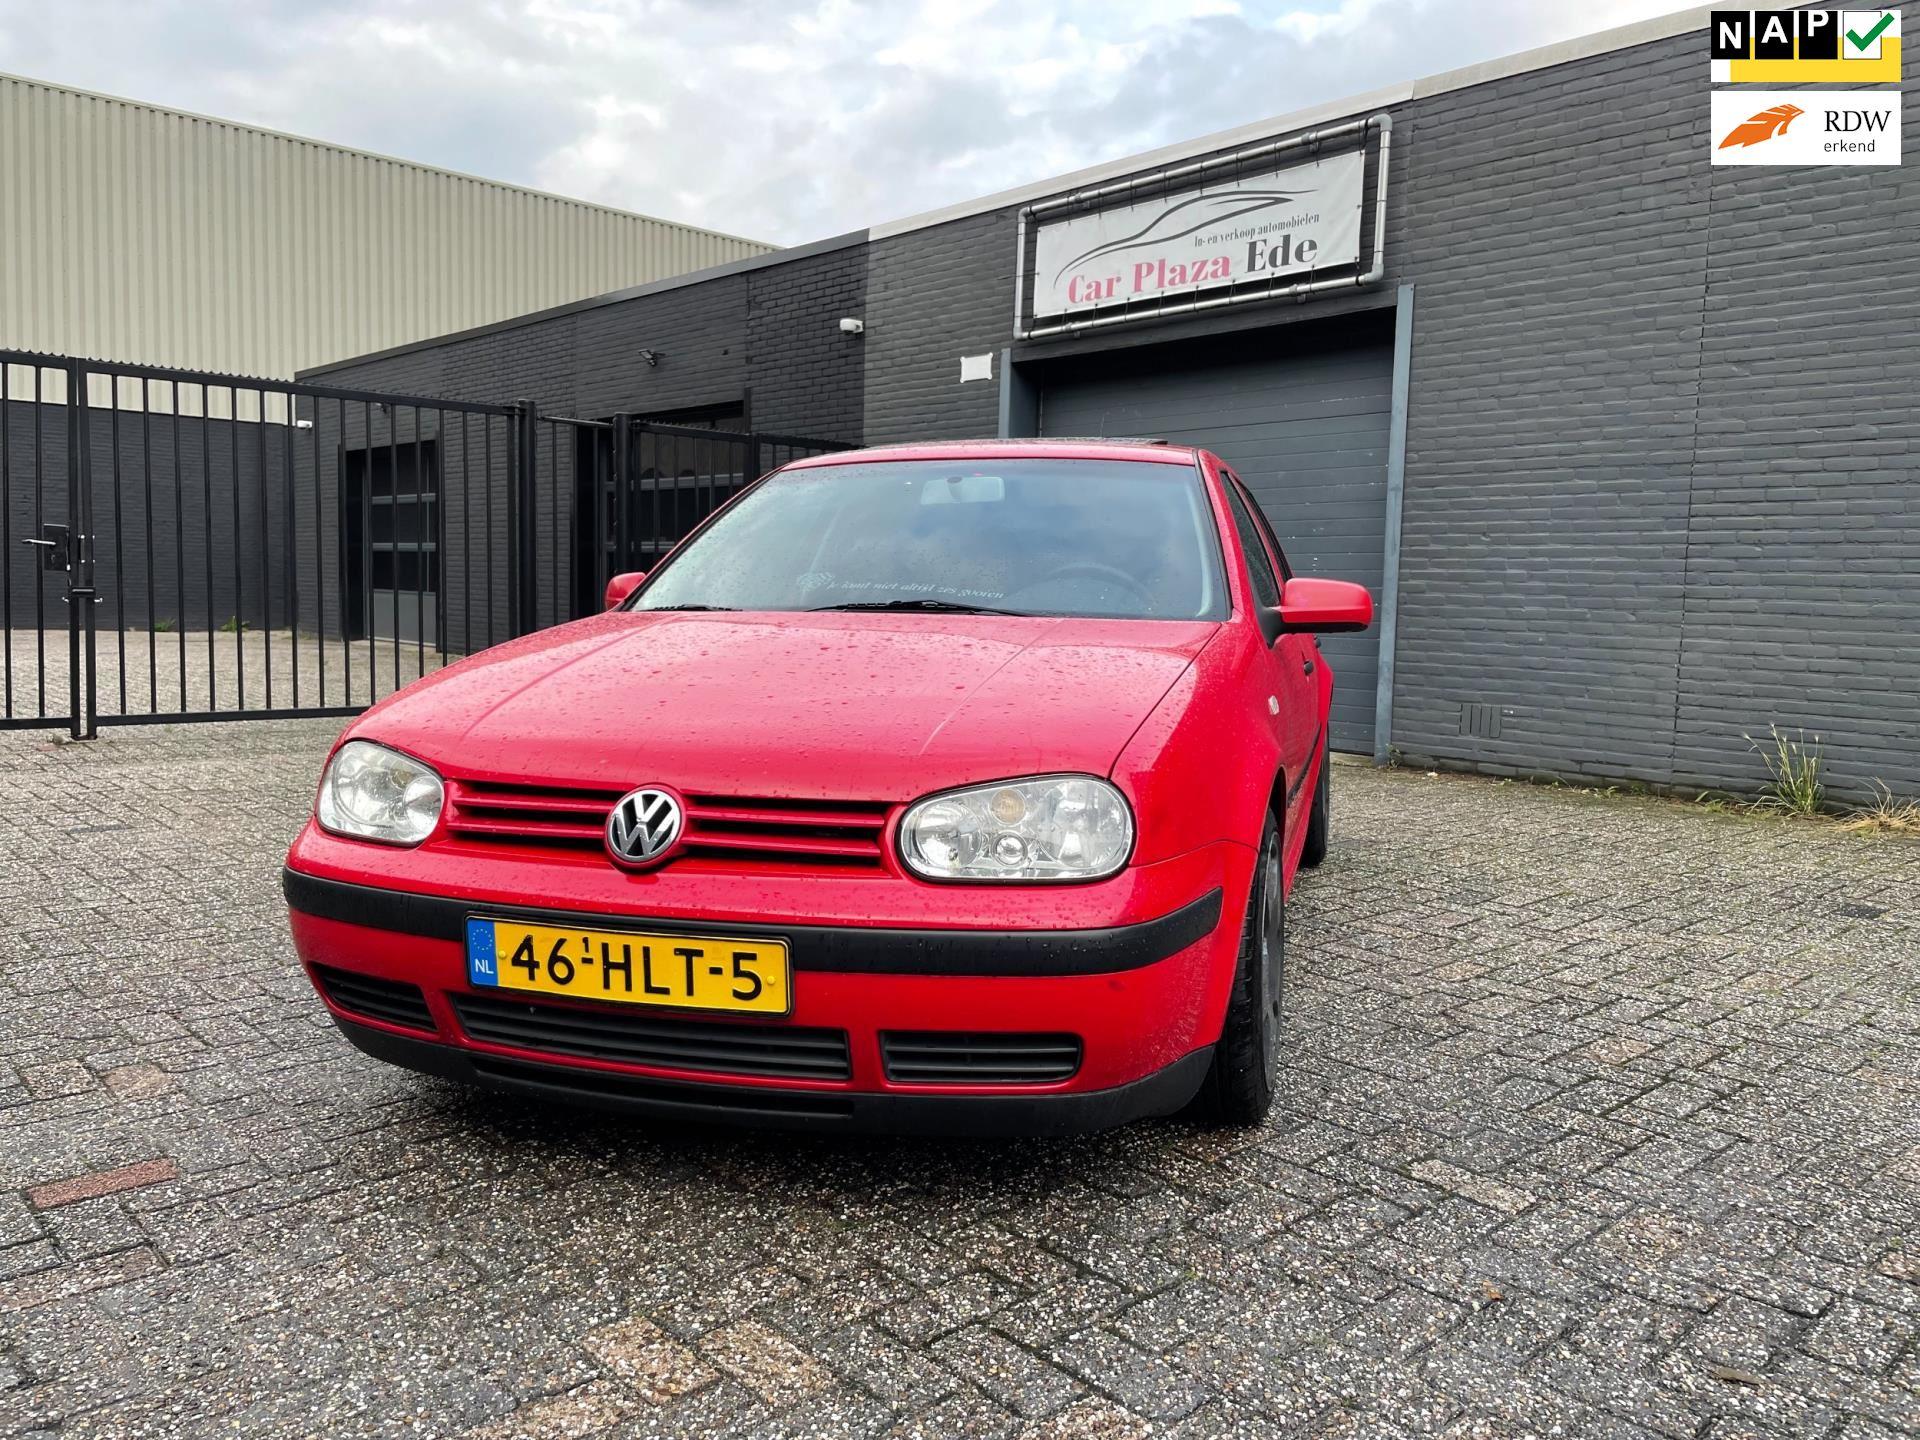 Volkswagen Golf occasion - Carplaza Ede